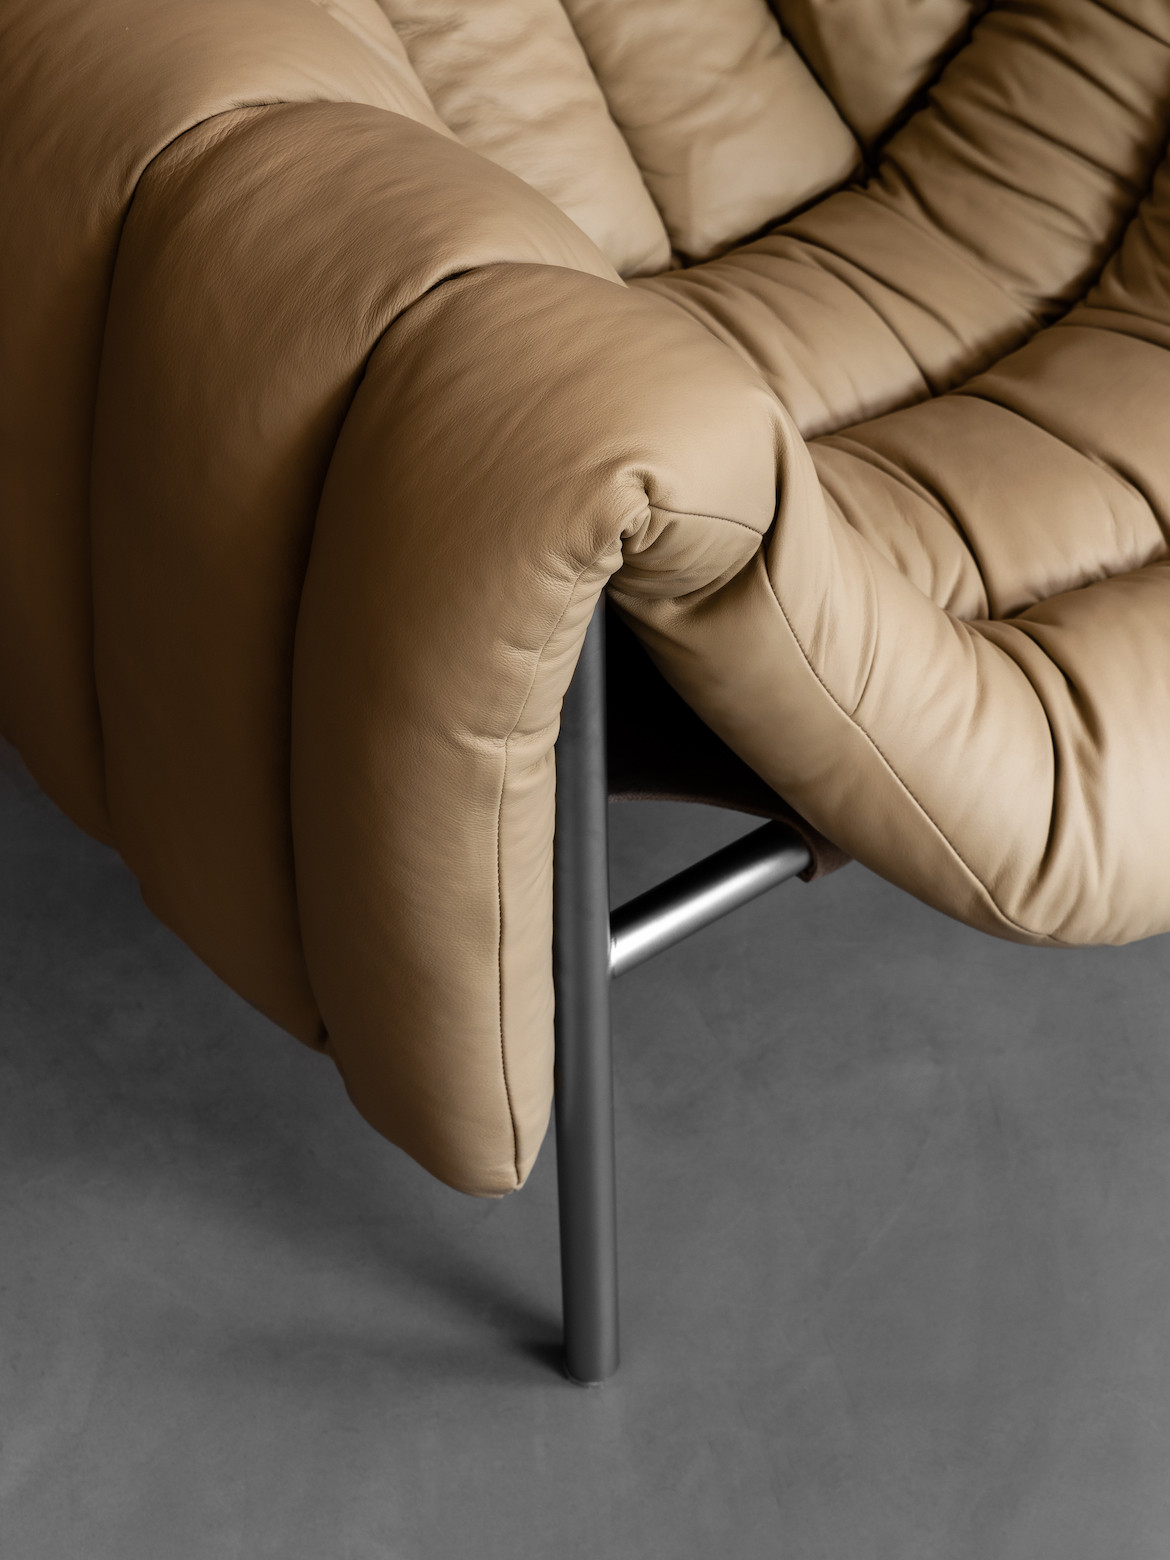 Fay Toogood's Puffy Armchair